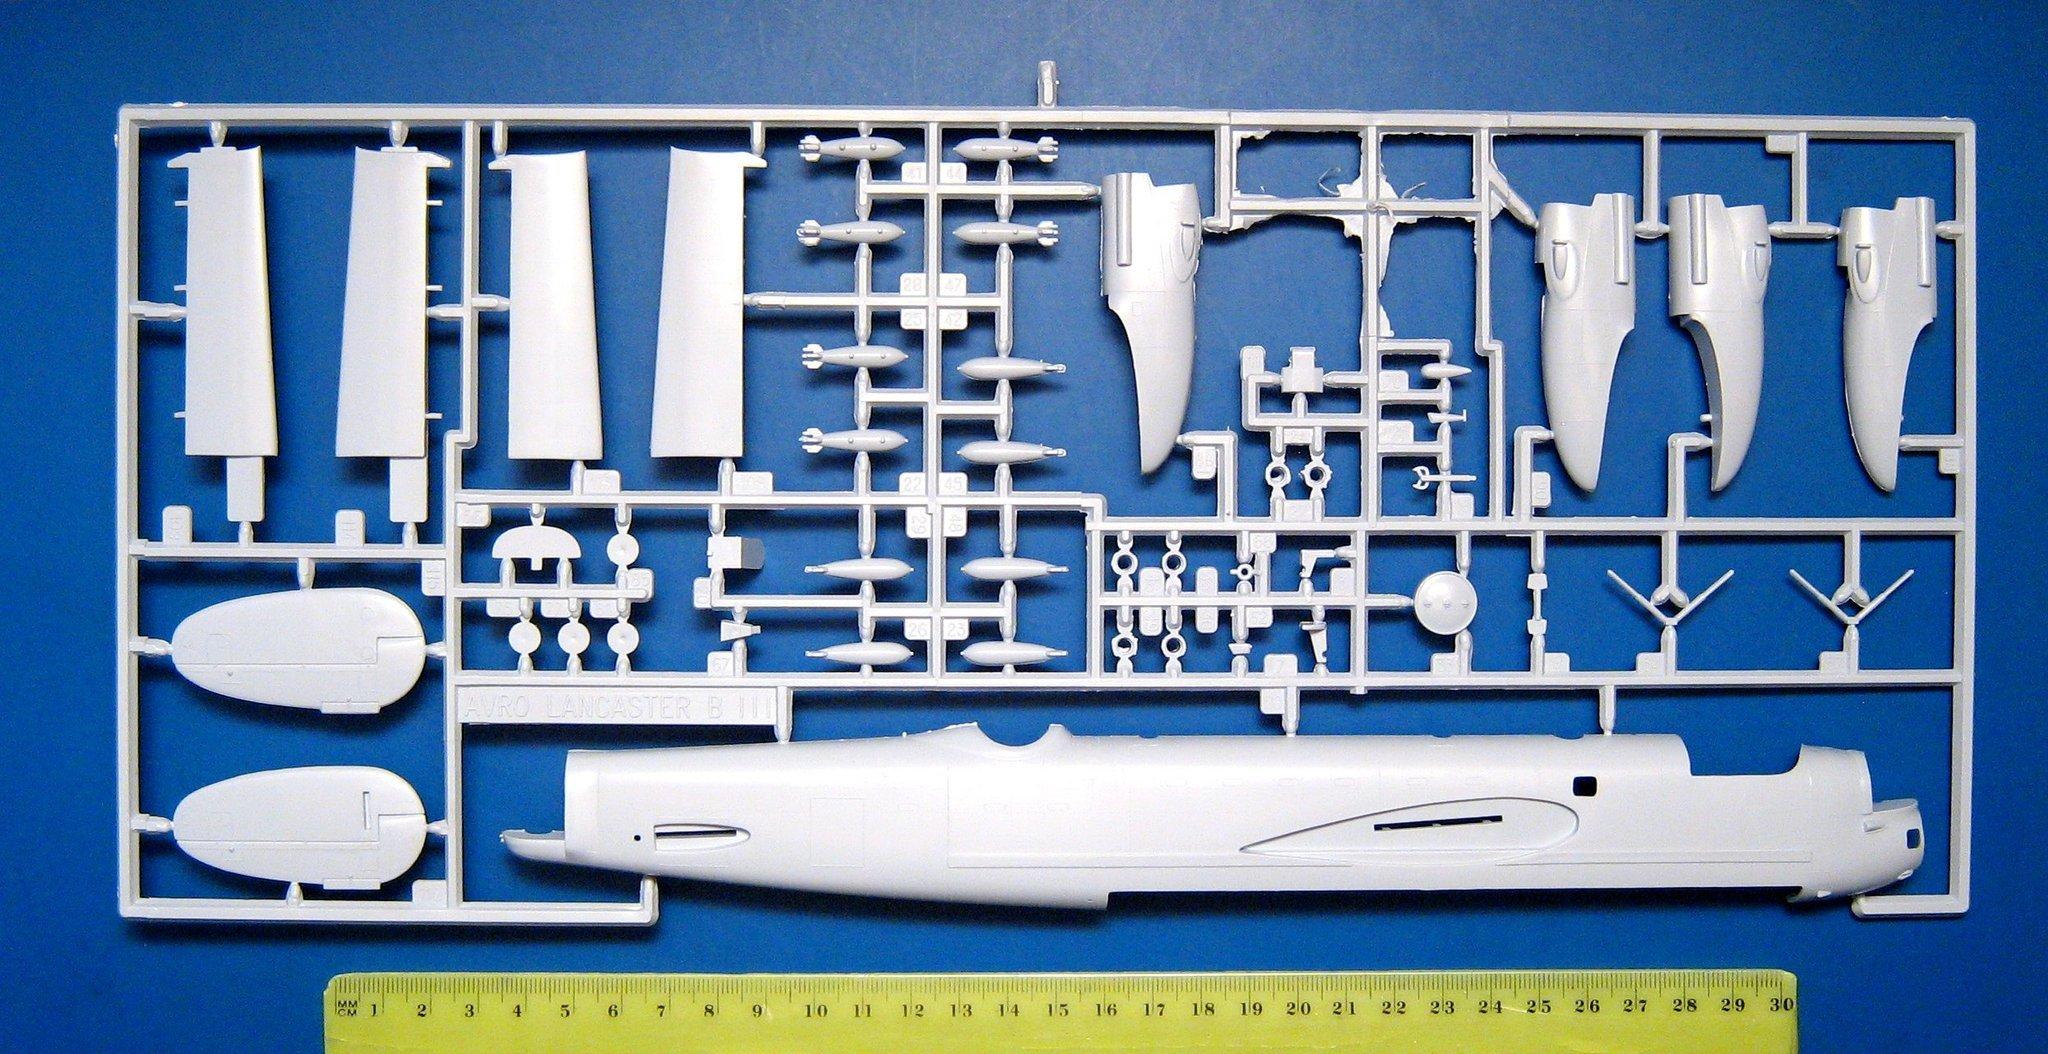 Airfix catalogue 2012